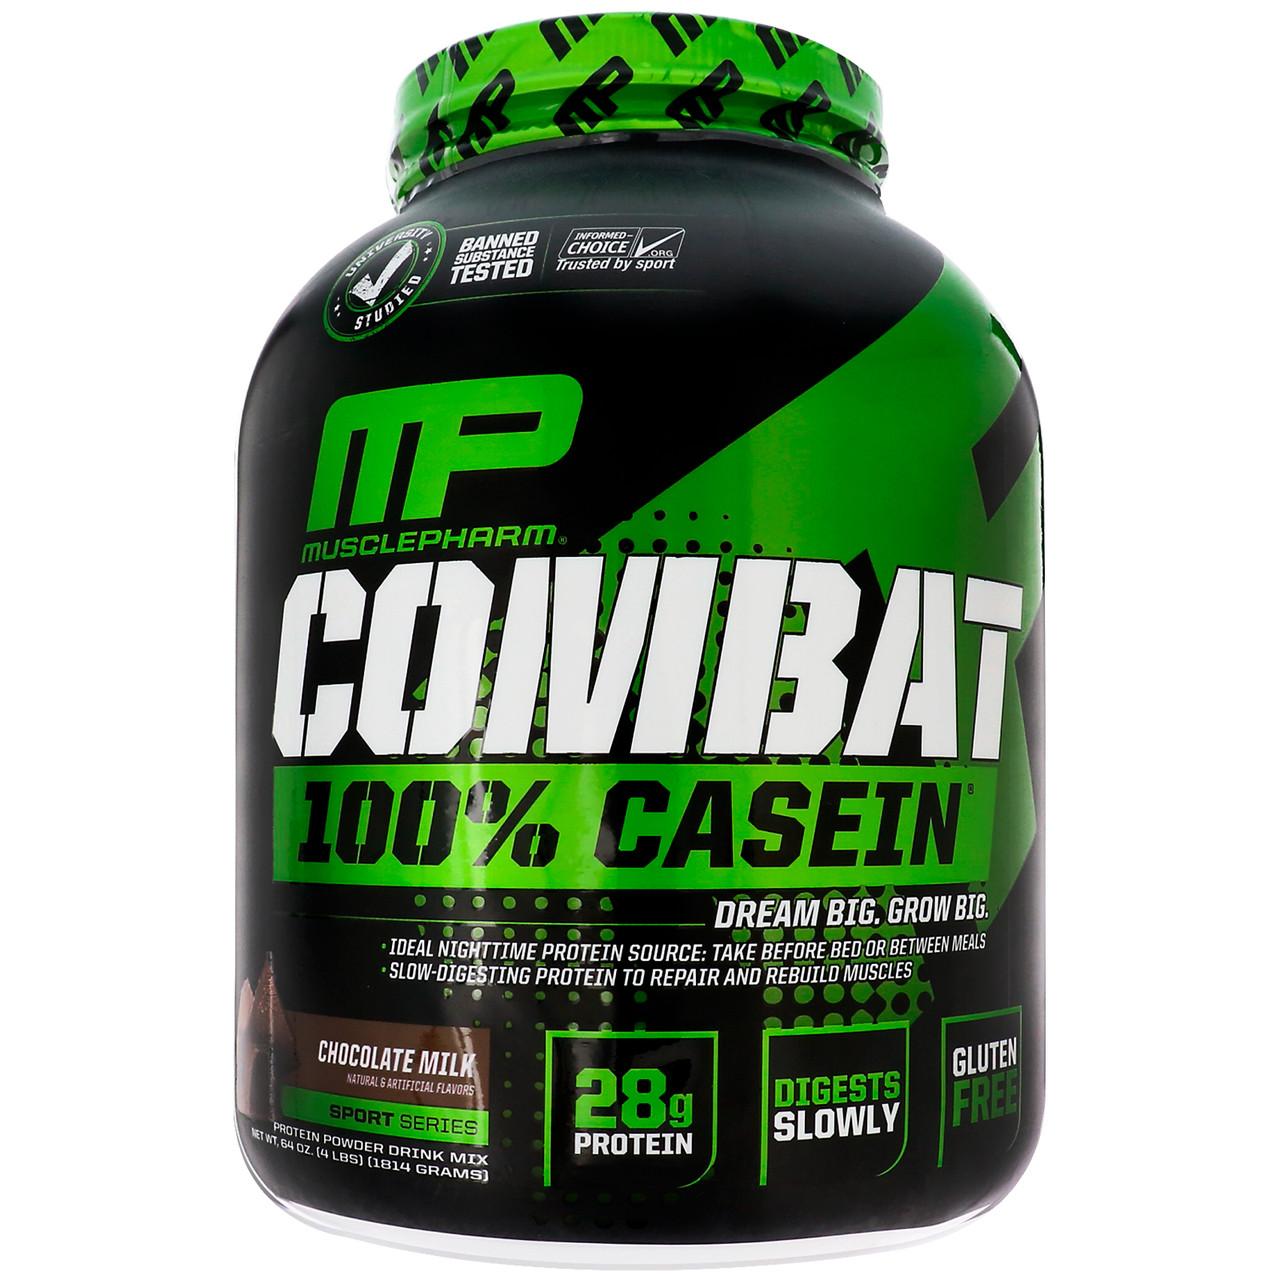 Міцелярні казеїн, (Combat, 100% Micellar Casein Protein), шоколад, Muscle Pharm, 1814 кг